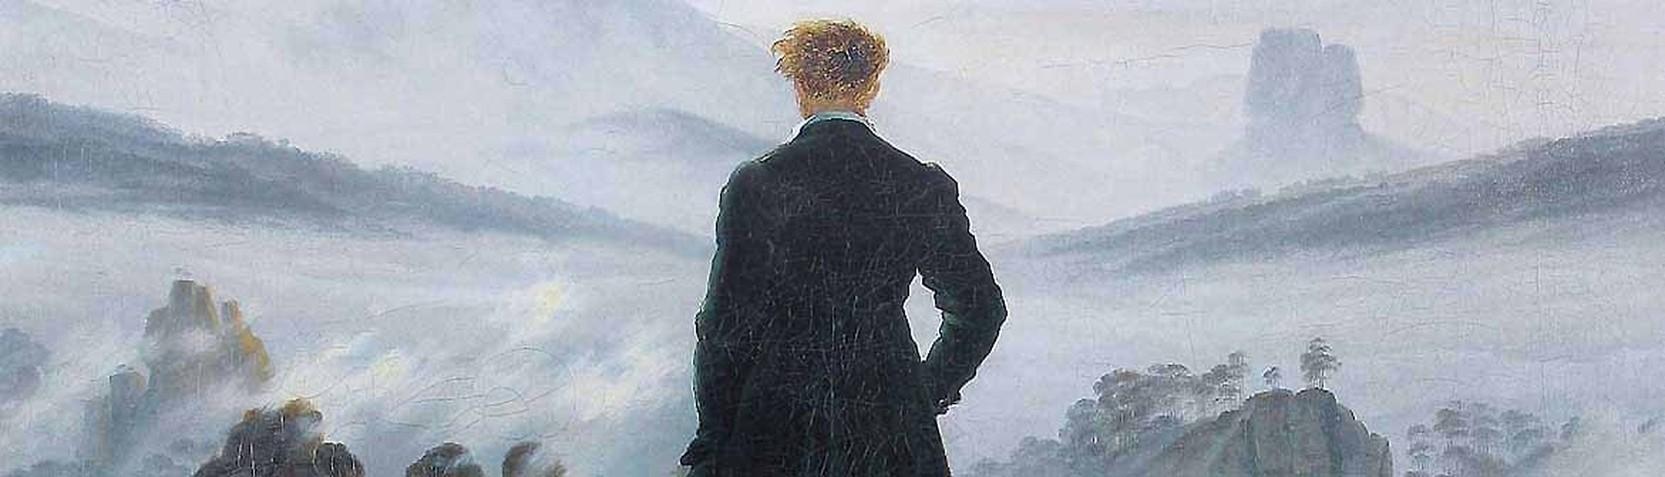 Artistas - Caspar David Friedrich